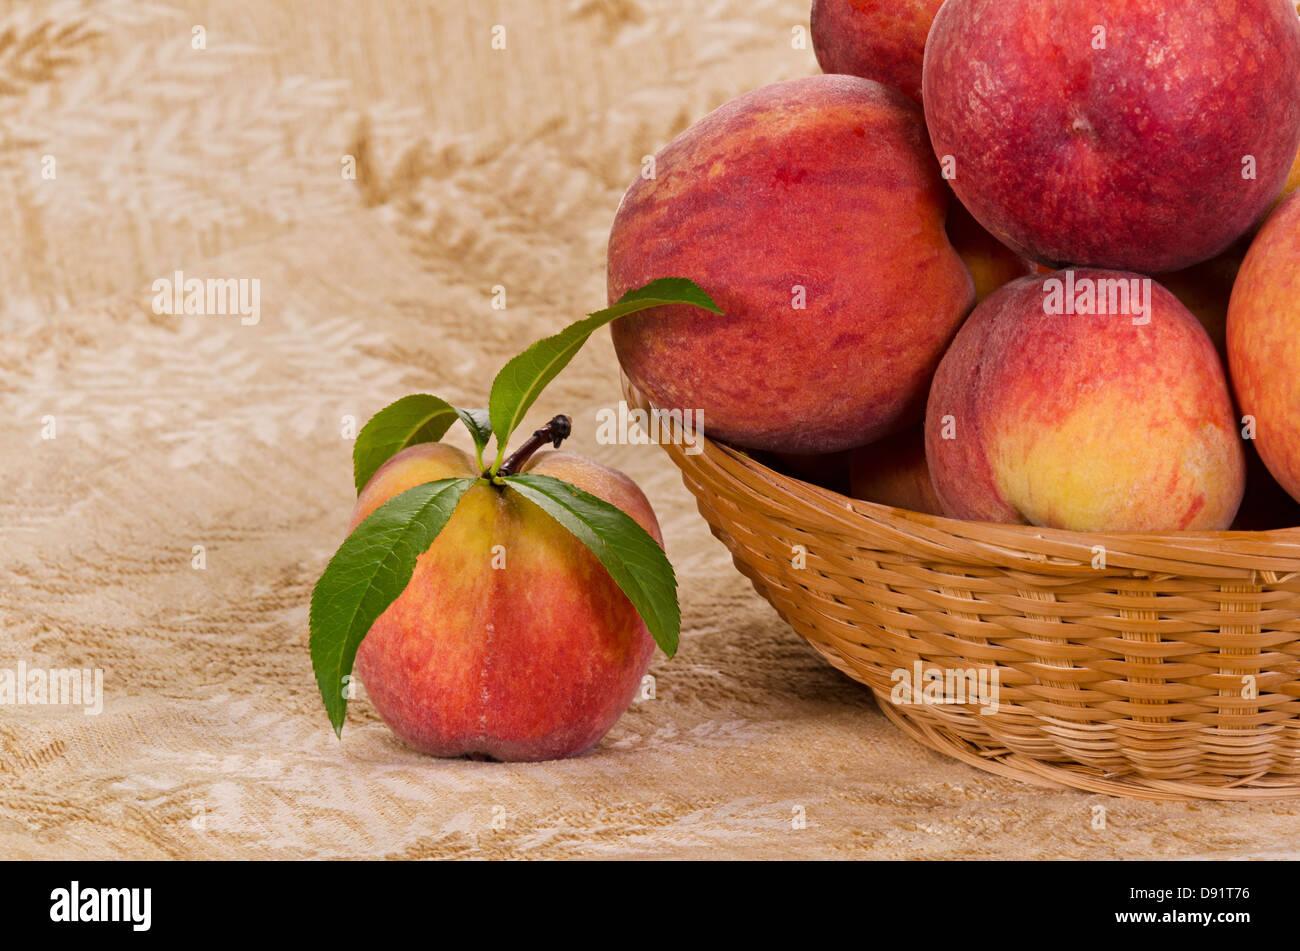 Juicy peach com